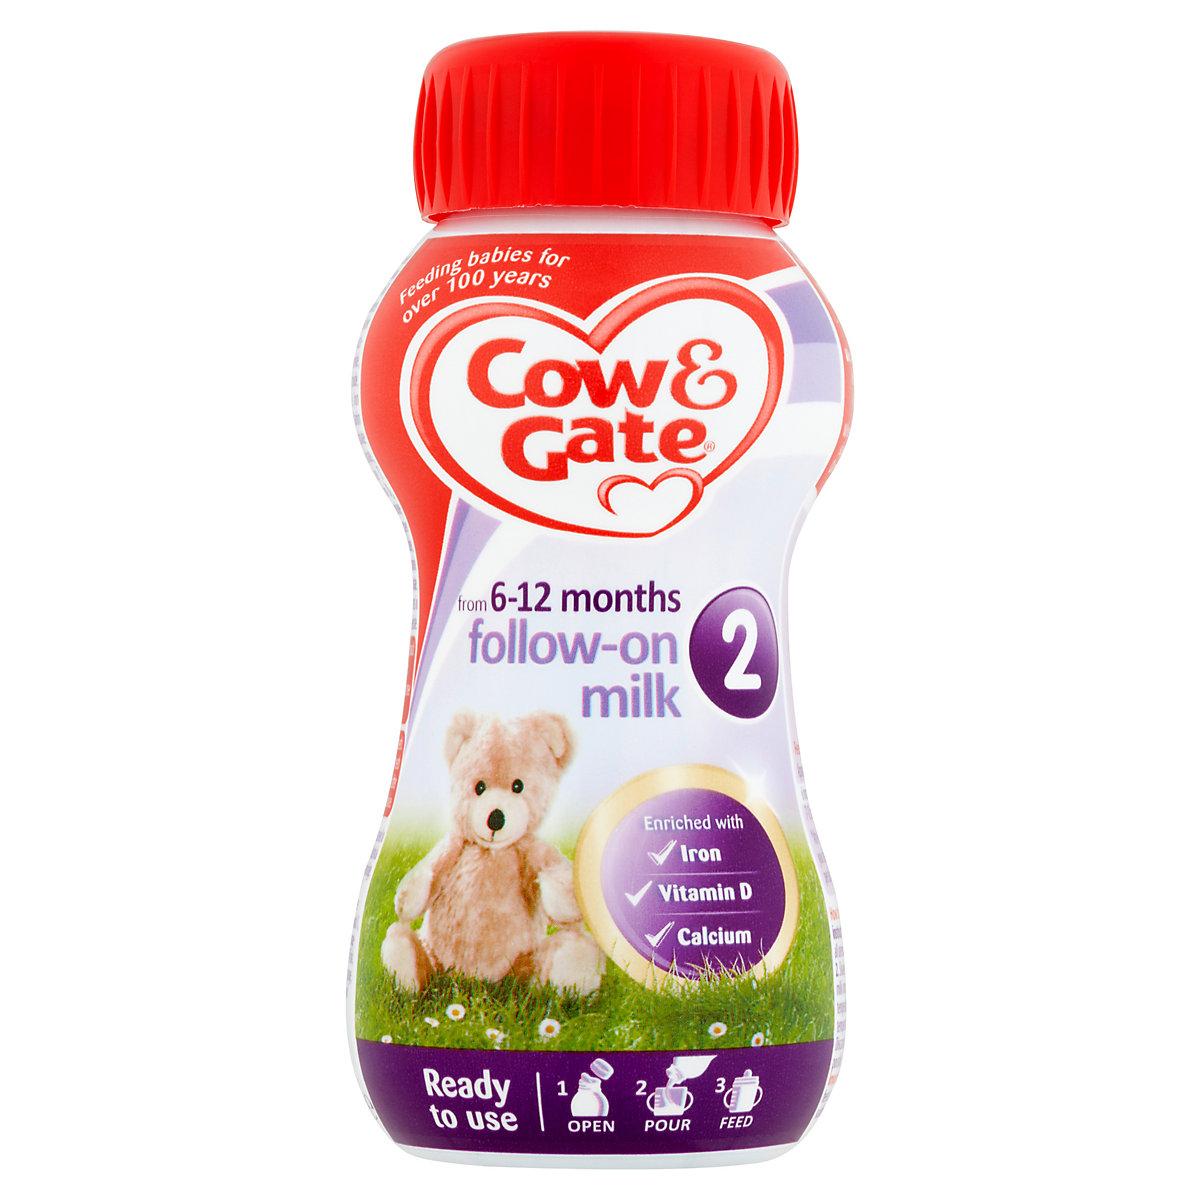 Cow & Gate 2 follow on baby milk formula 200ml